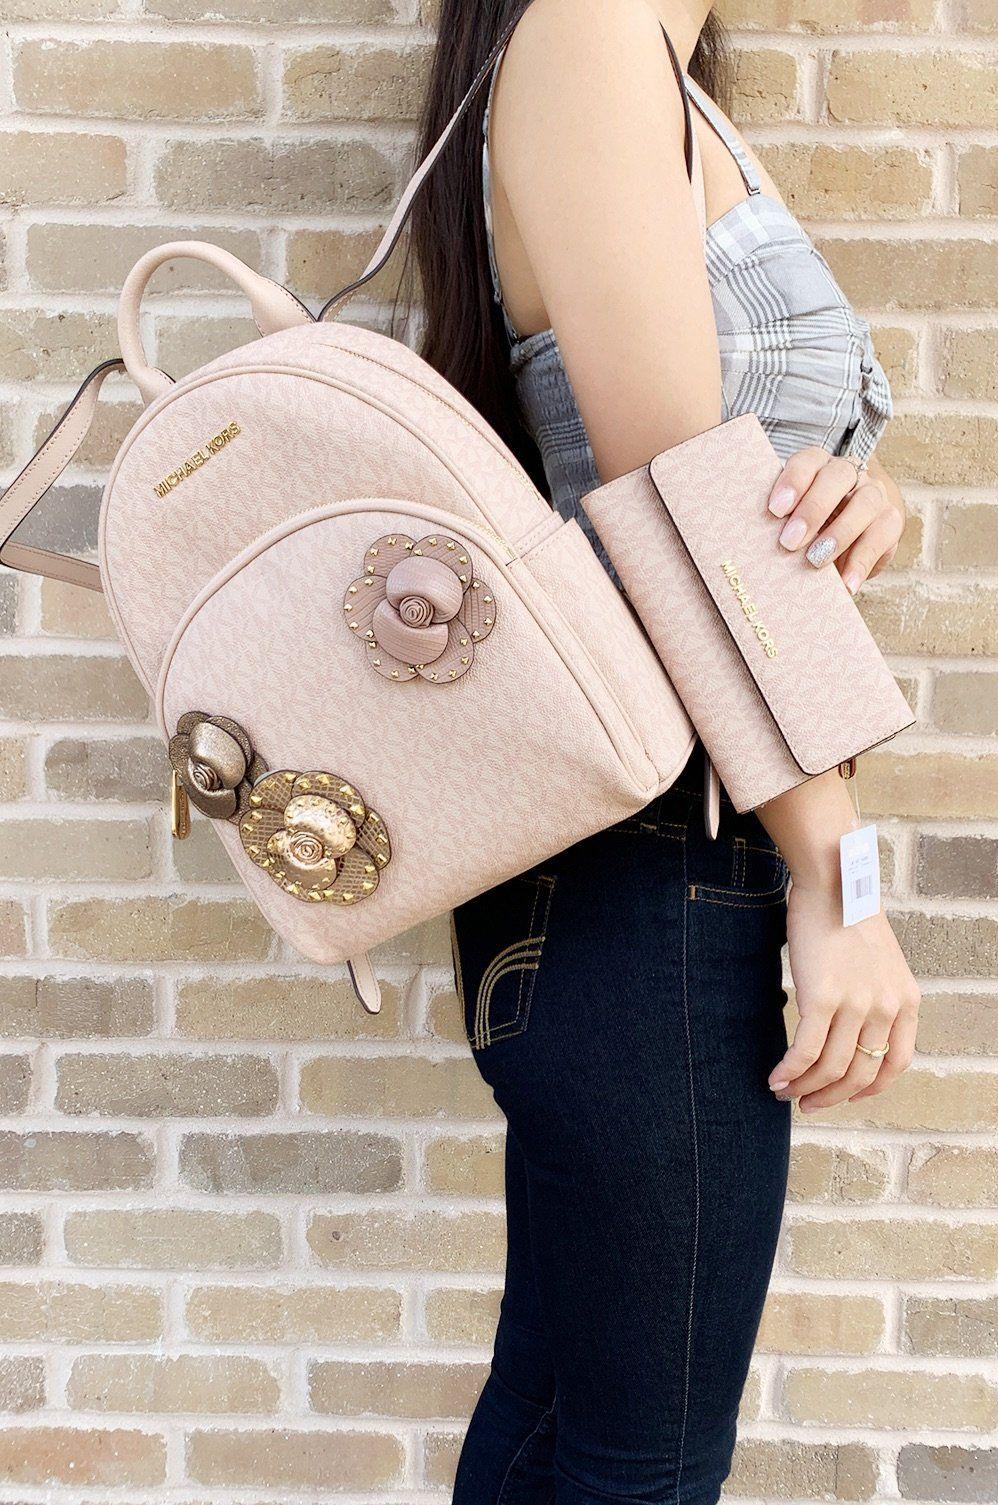 7c63bf4c8004 Michael Kors Abbey Medium Backpack Floral Pink MK Trifold Wallet SET   ebayseller  top  ebaycommunity  posh  amazondeals  poshfashion  posher   topratedseller ...